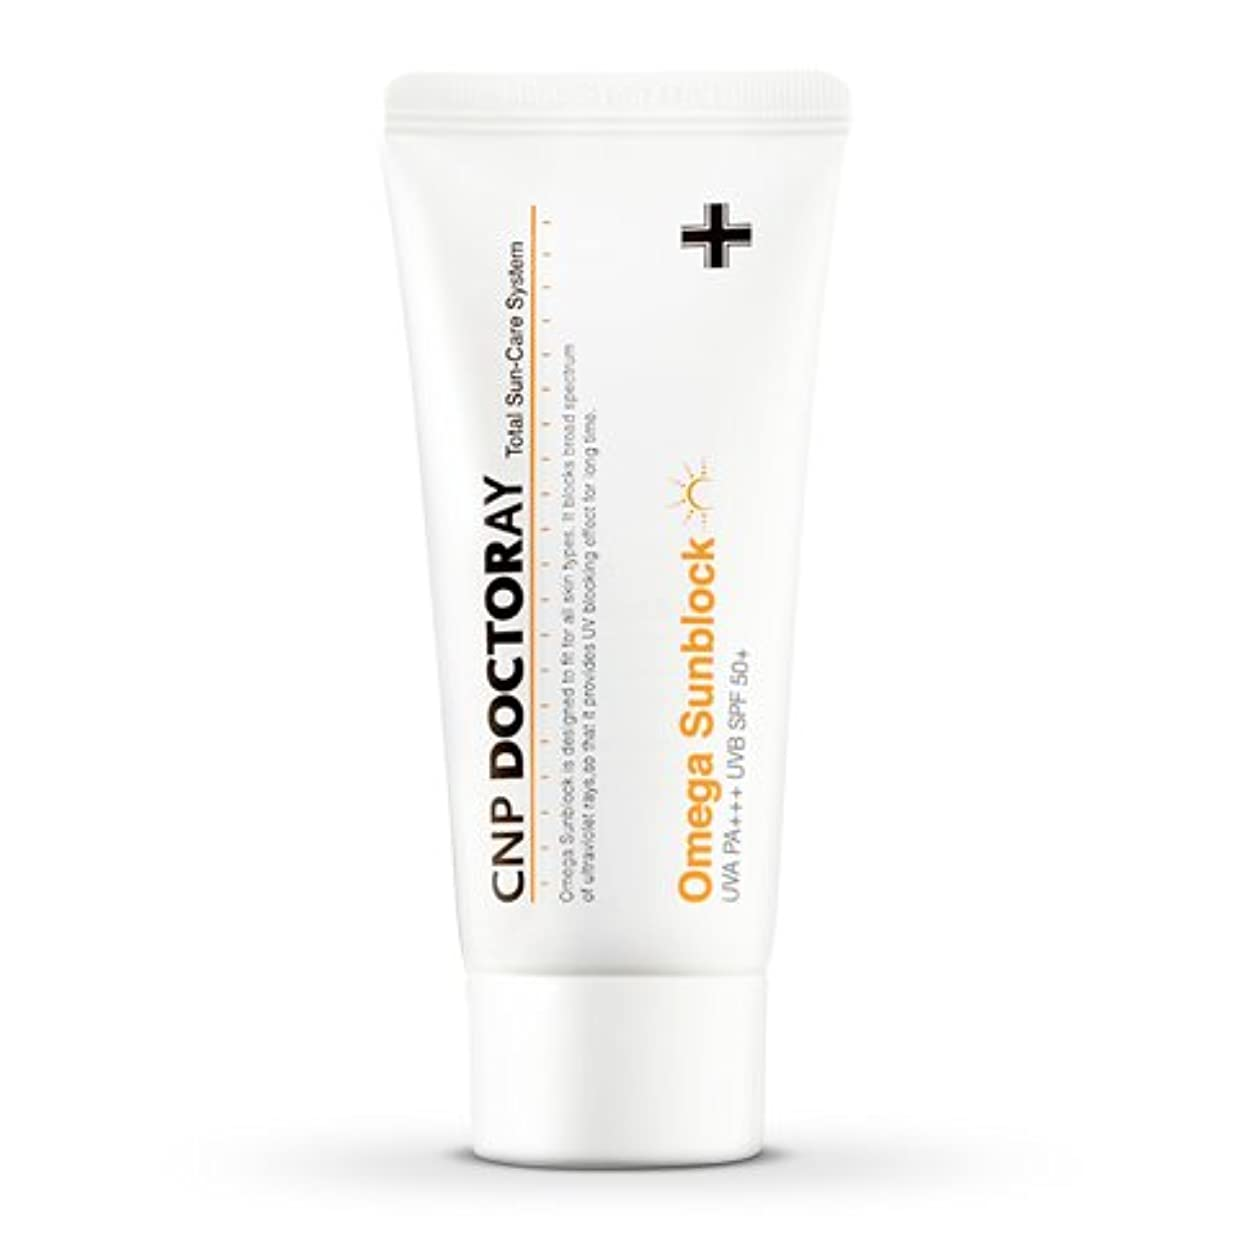 CNP Laboratory ドクトレイオメガサンブロック/Doctoray Omega SunBlock 60ml [並行輸入品]